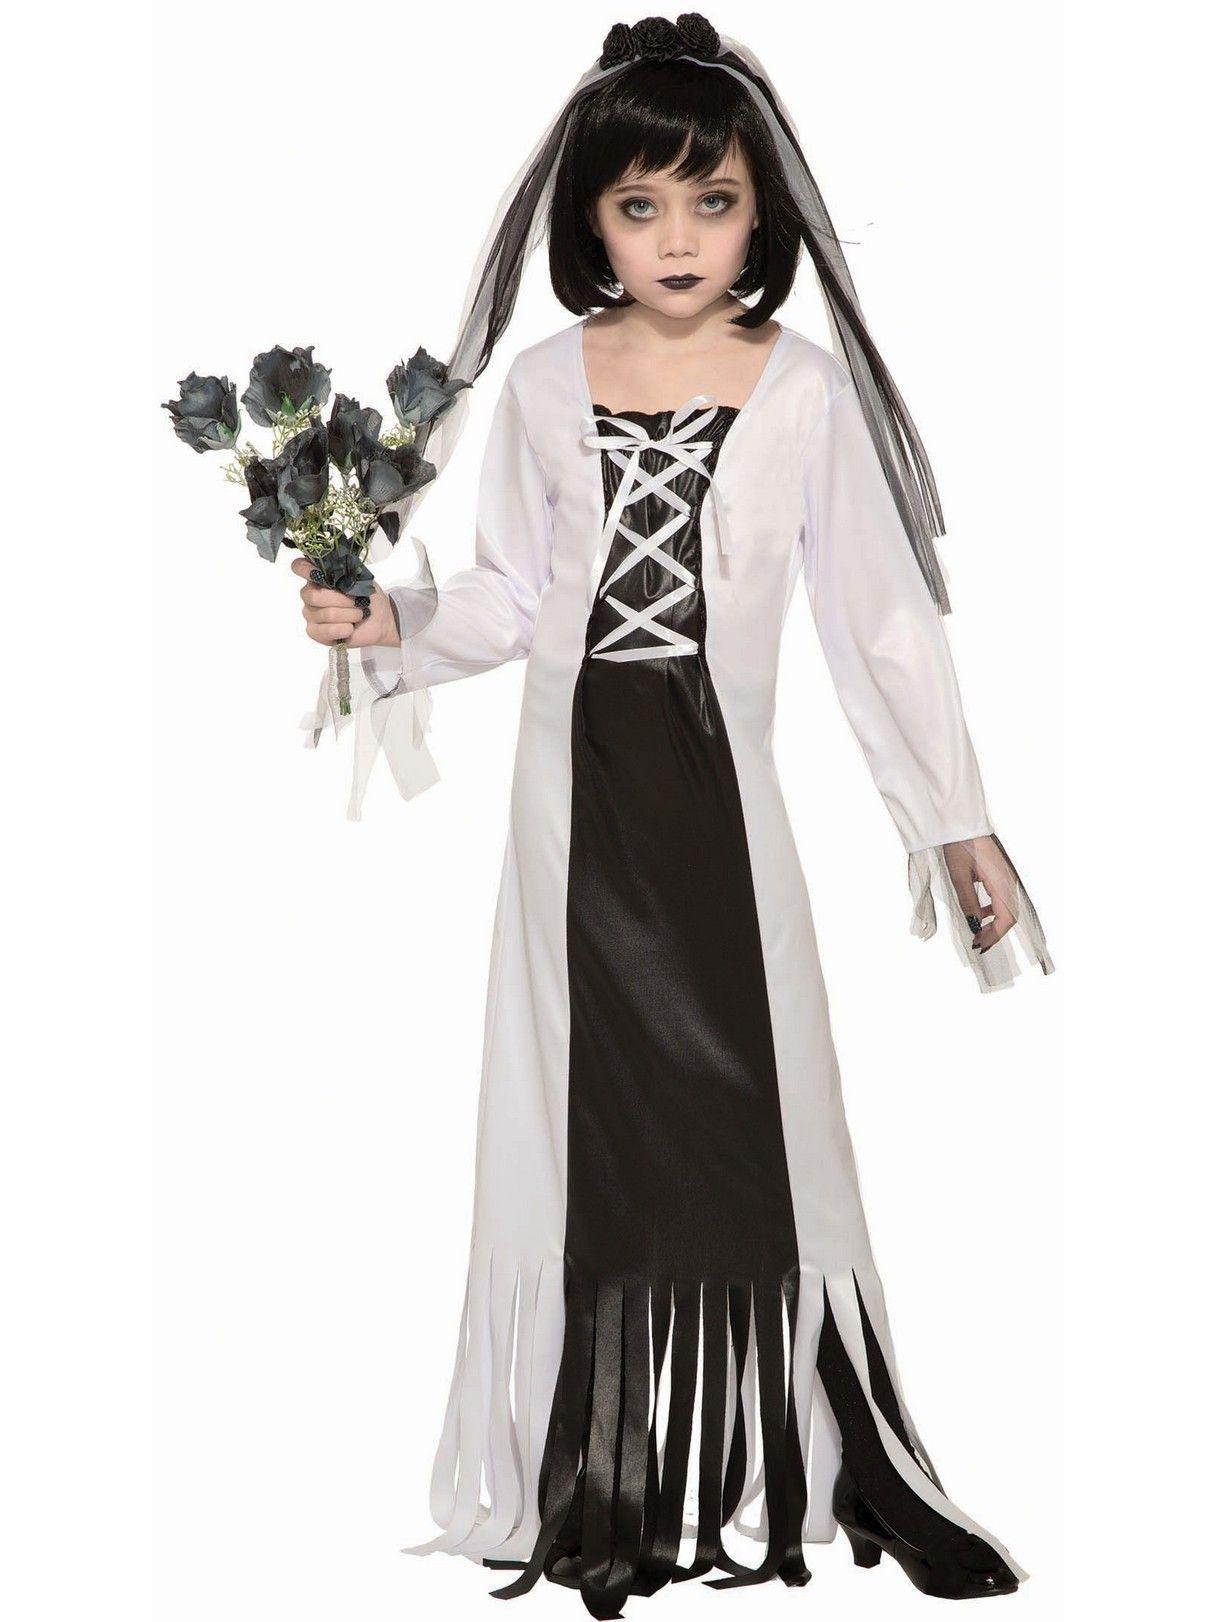 Cemetary Bride Costume Bride Costume Halloween Costumes For